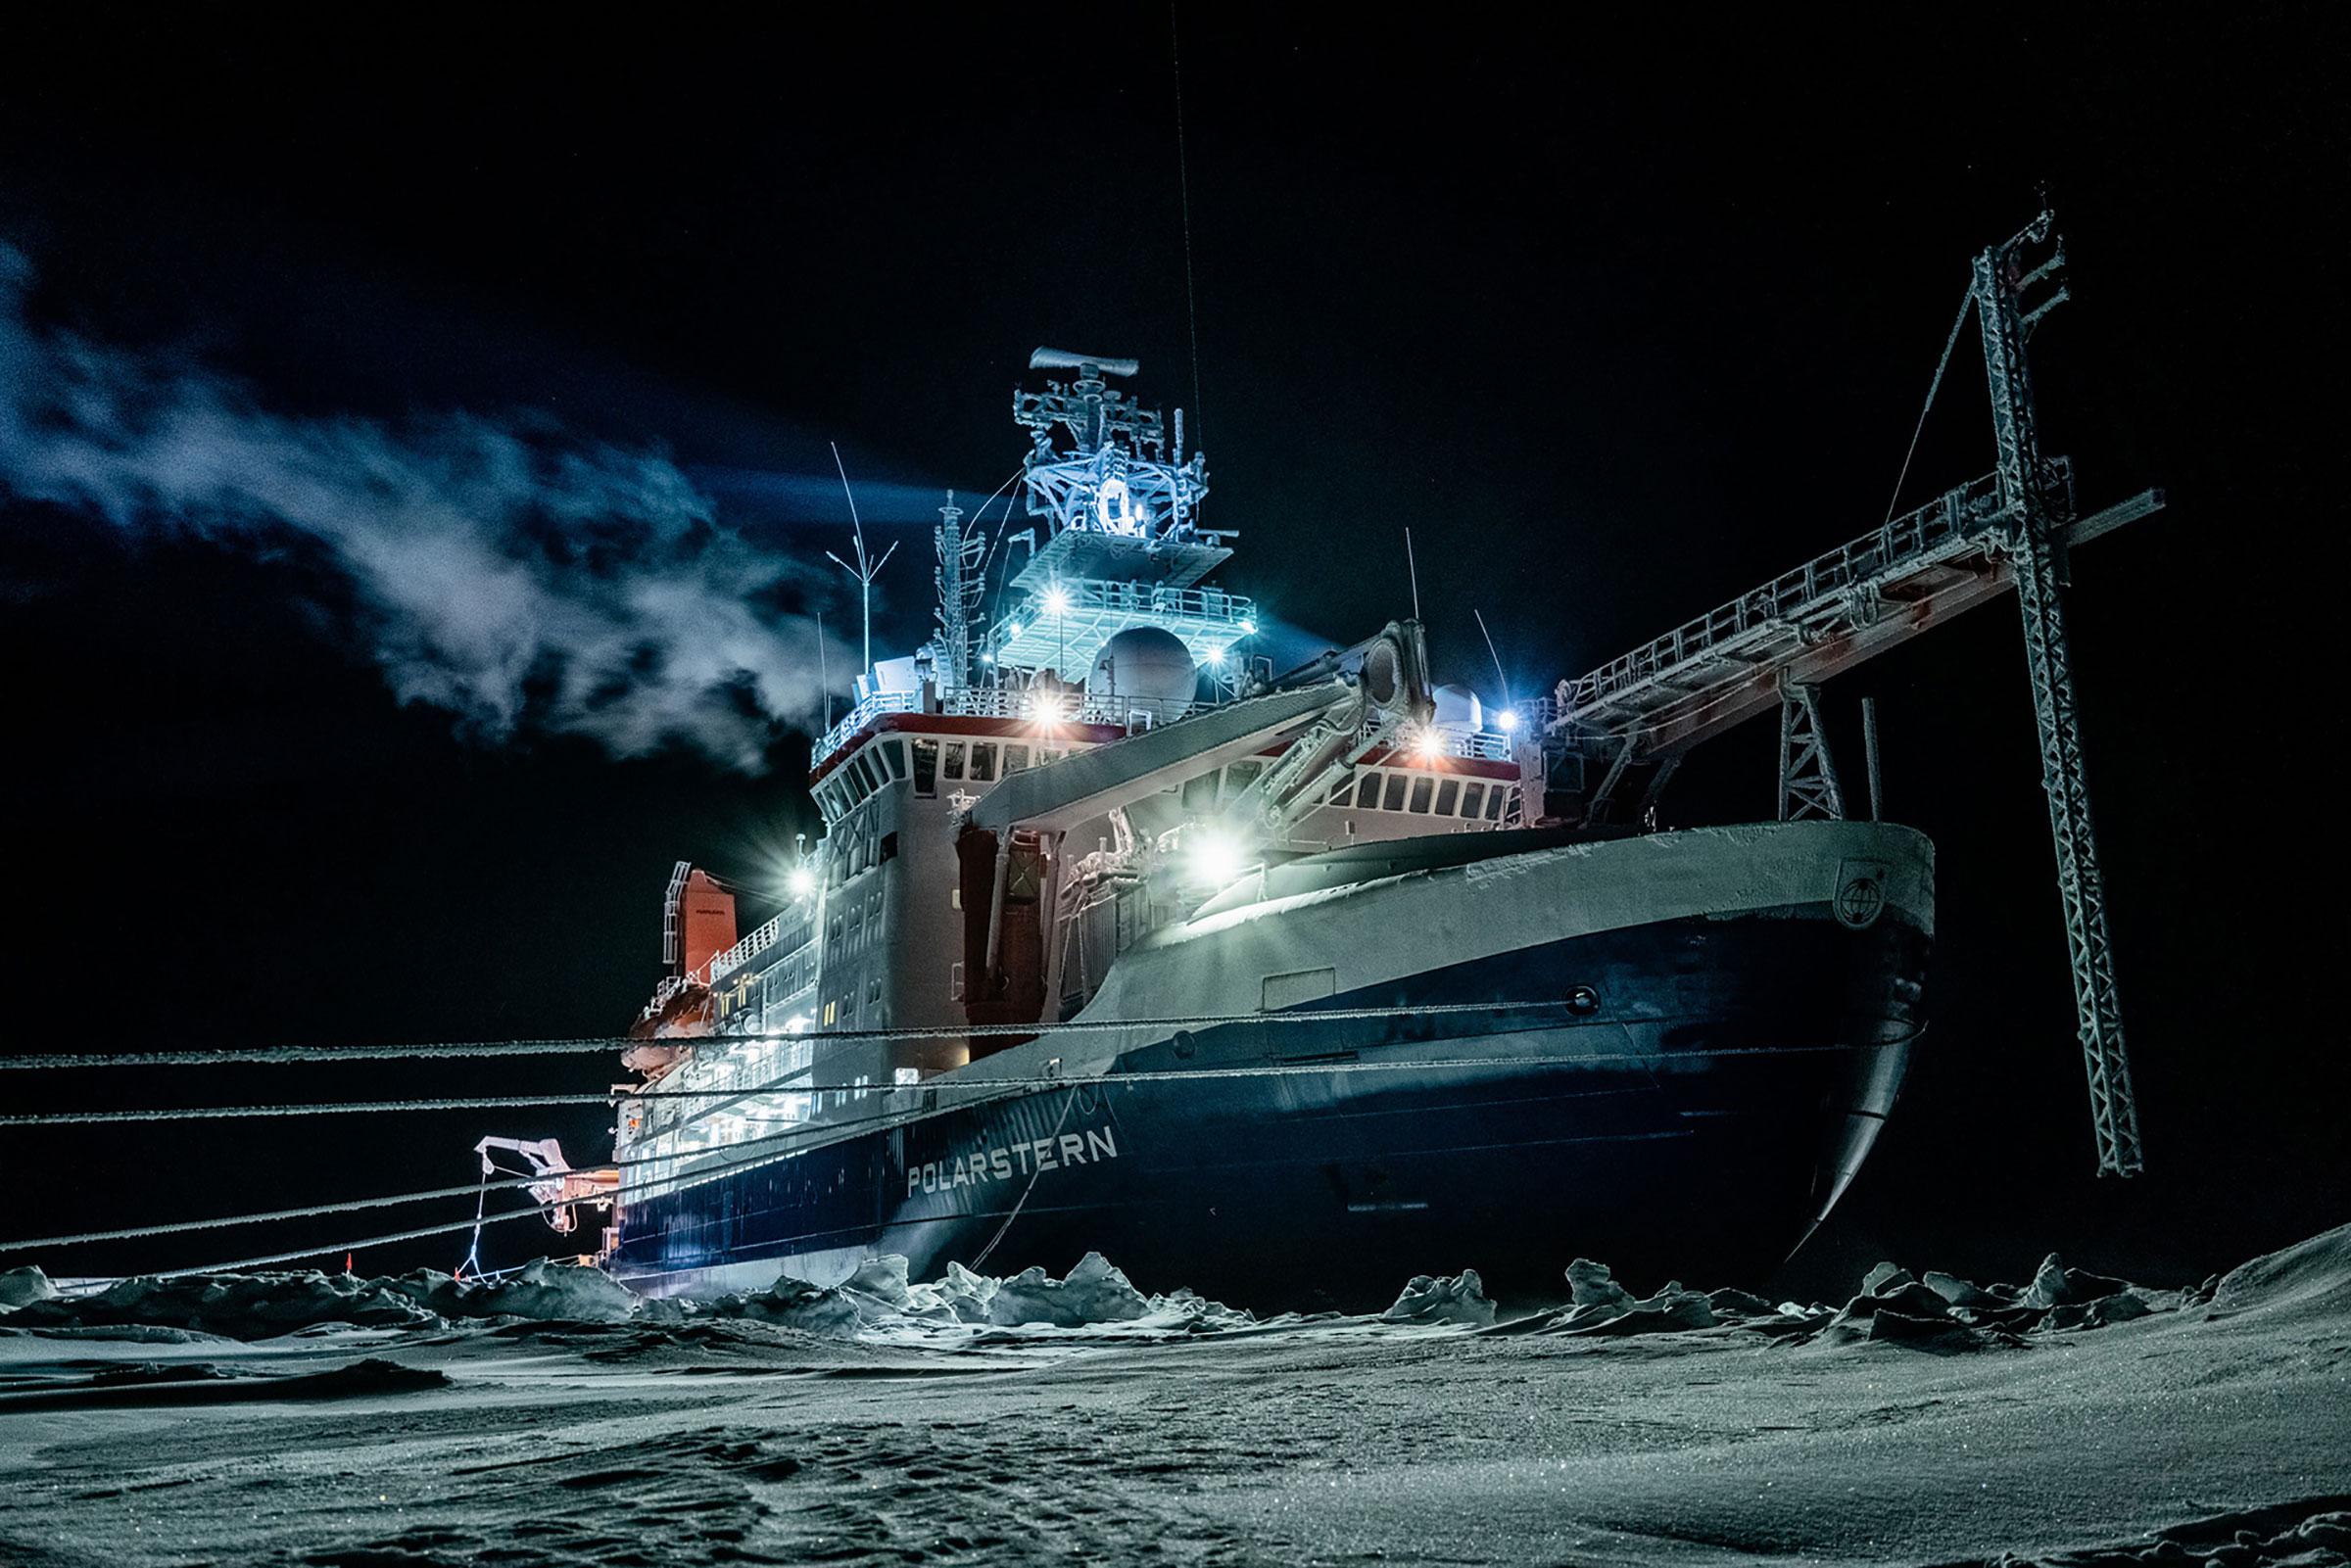 German research icebreaker  Polarstern  in the Central Arctic Ocean during polar night on Jan. 1, 2020.